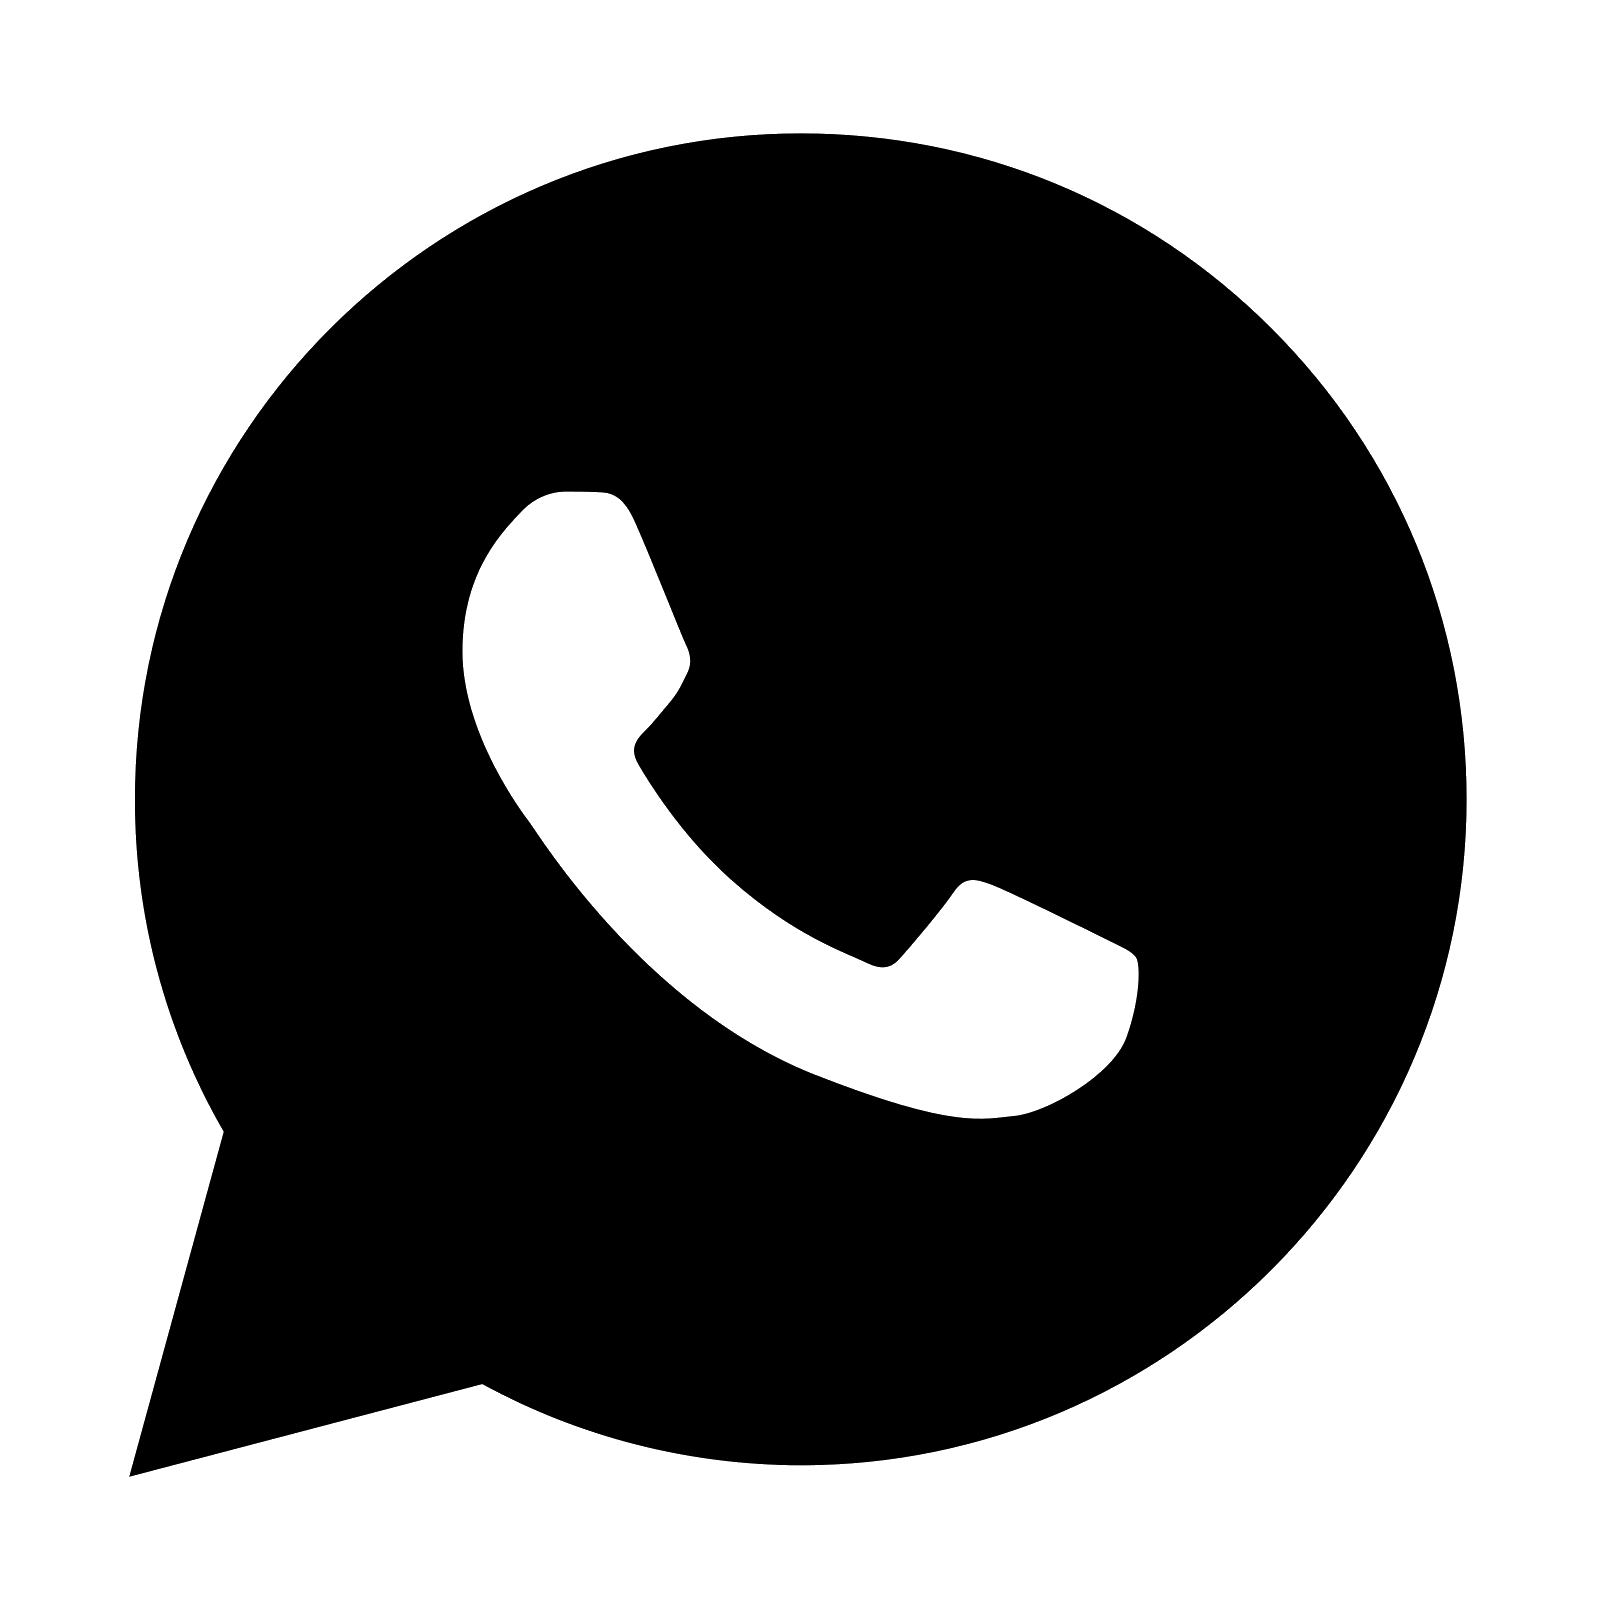 1600x1600 Whatsapp Computer Icons